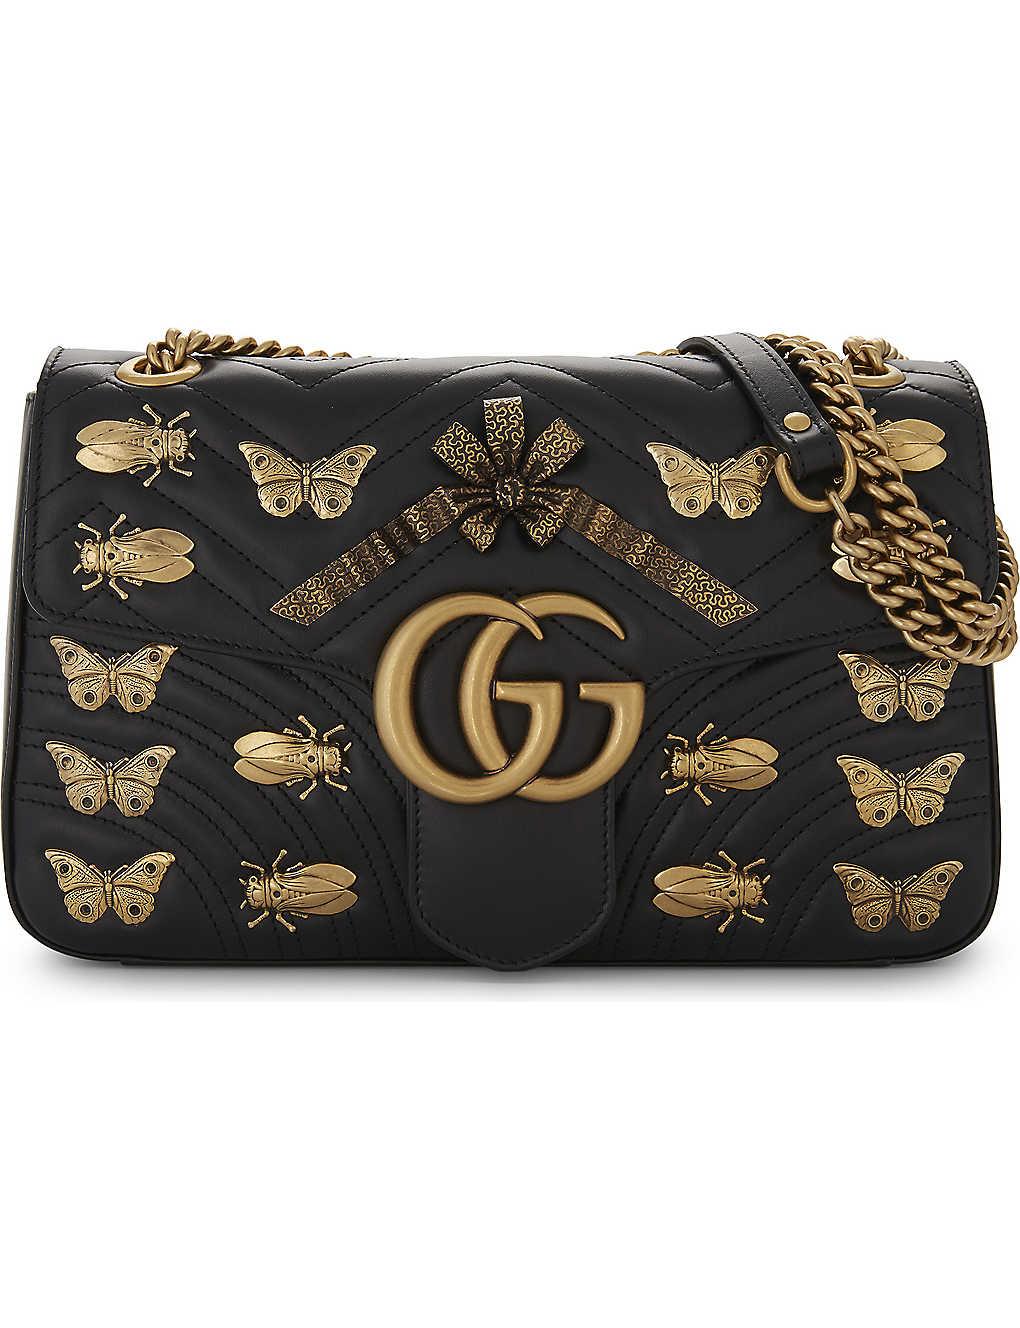 4648172999d9 GUCCI - GG Marmont animal stud cross-body bag | Selfridges.com